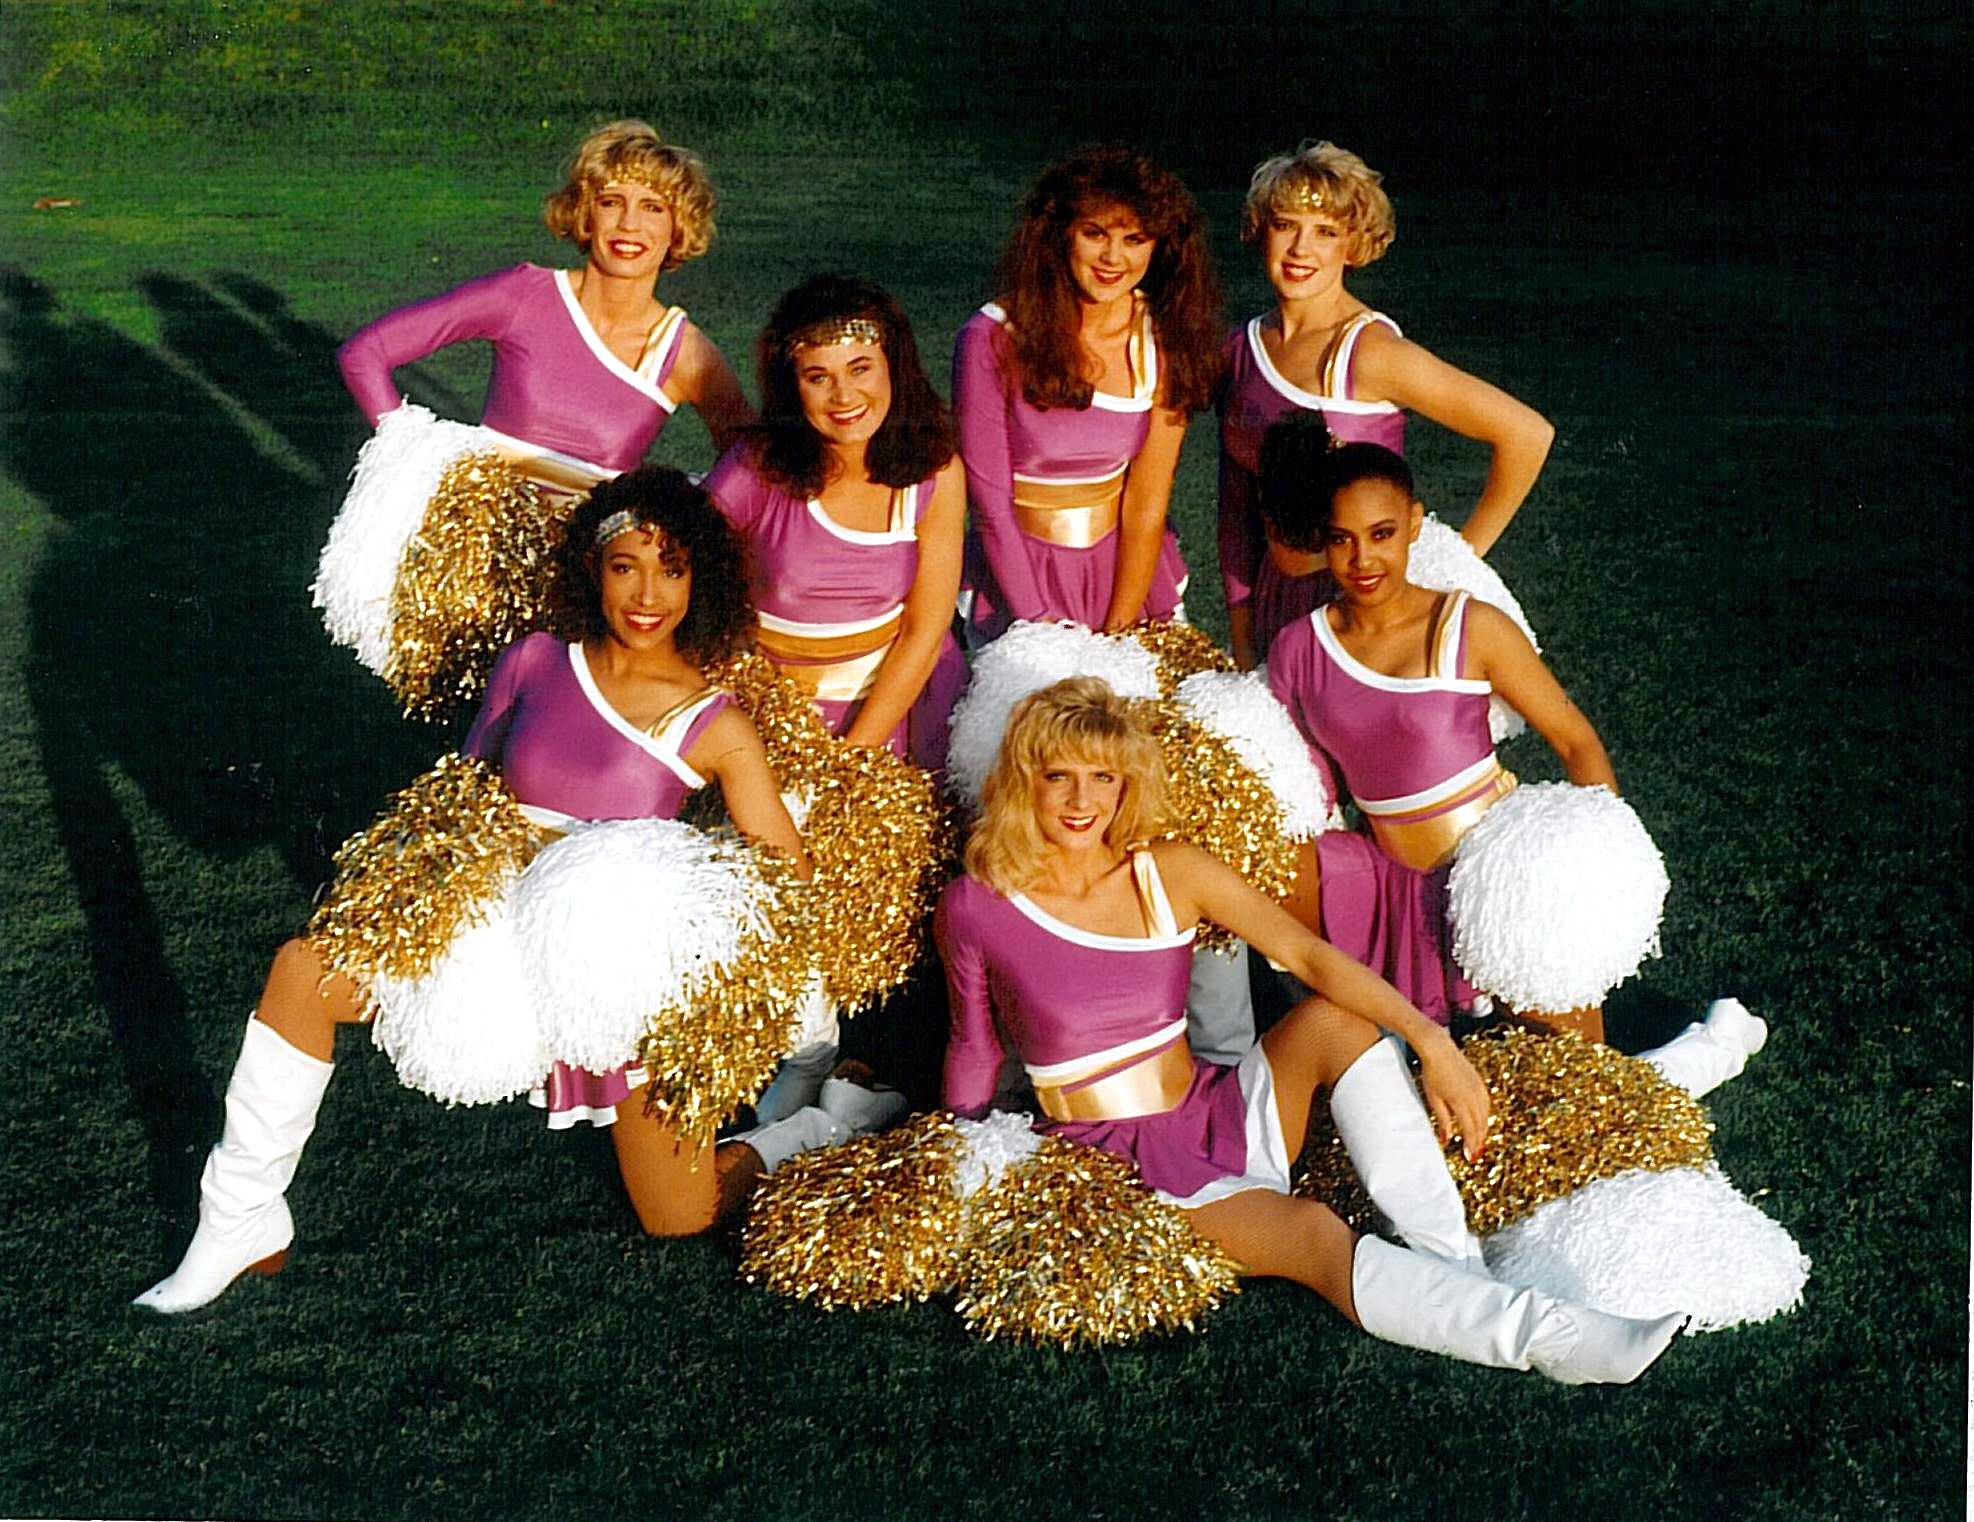 minnesota vikings cheerleaders old uniforms